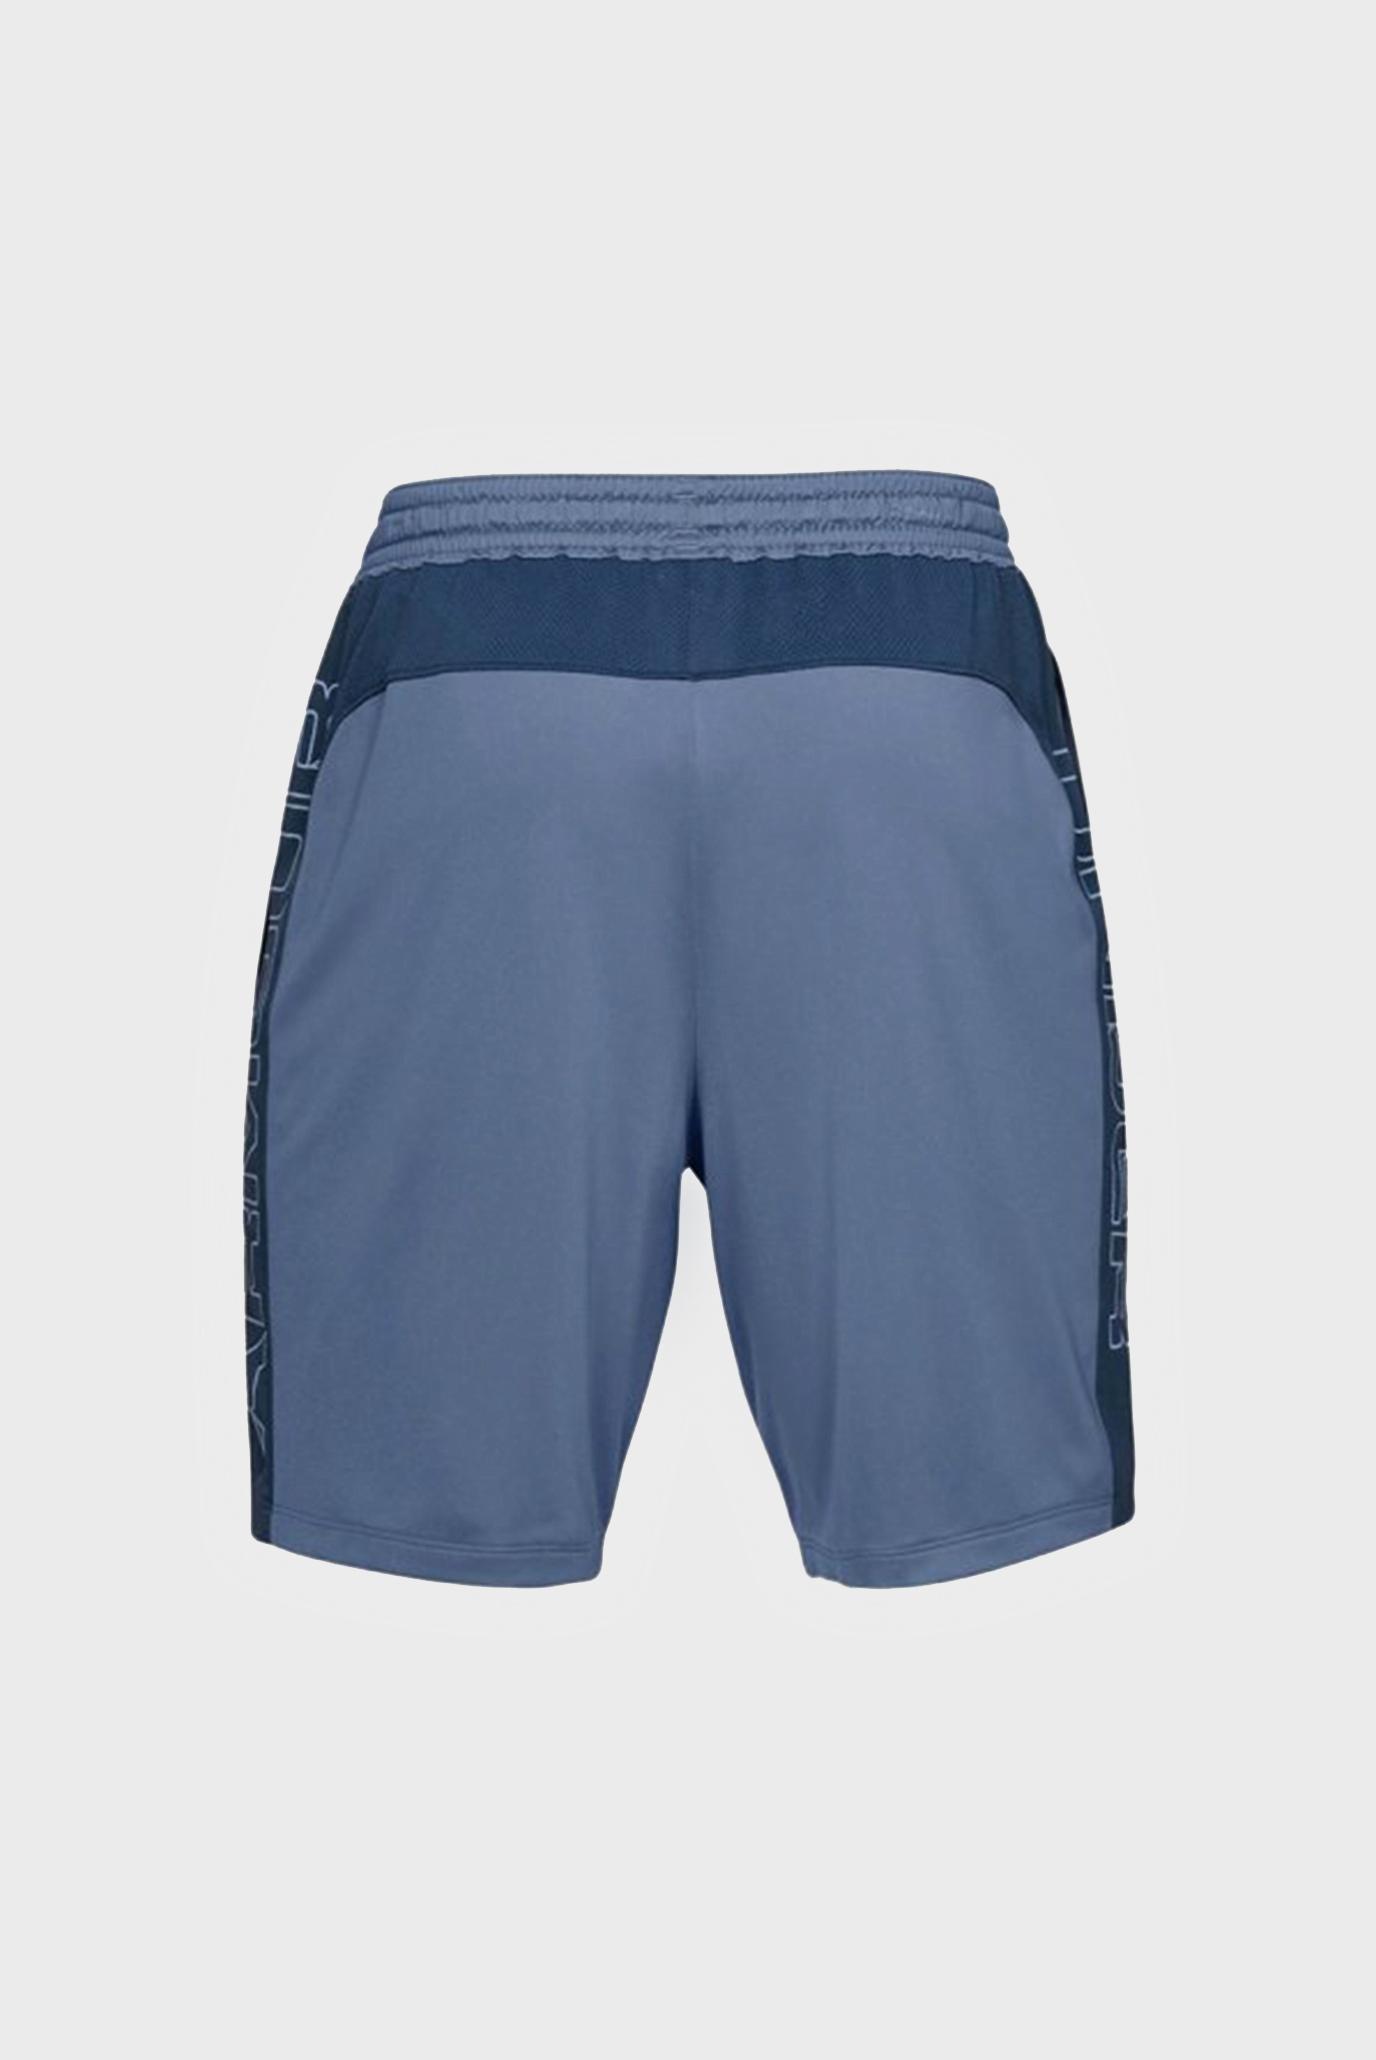 Мужские синие шорты MK1 Short 7in Wordmark Under Armour